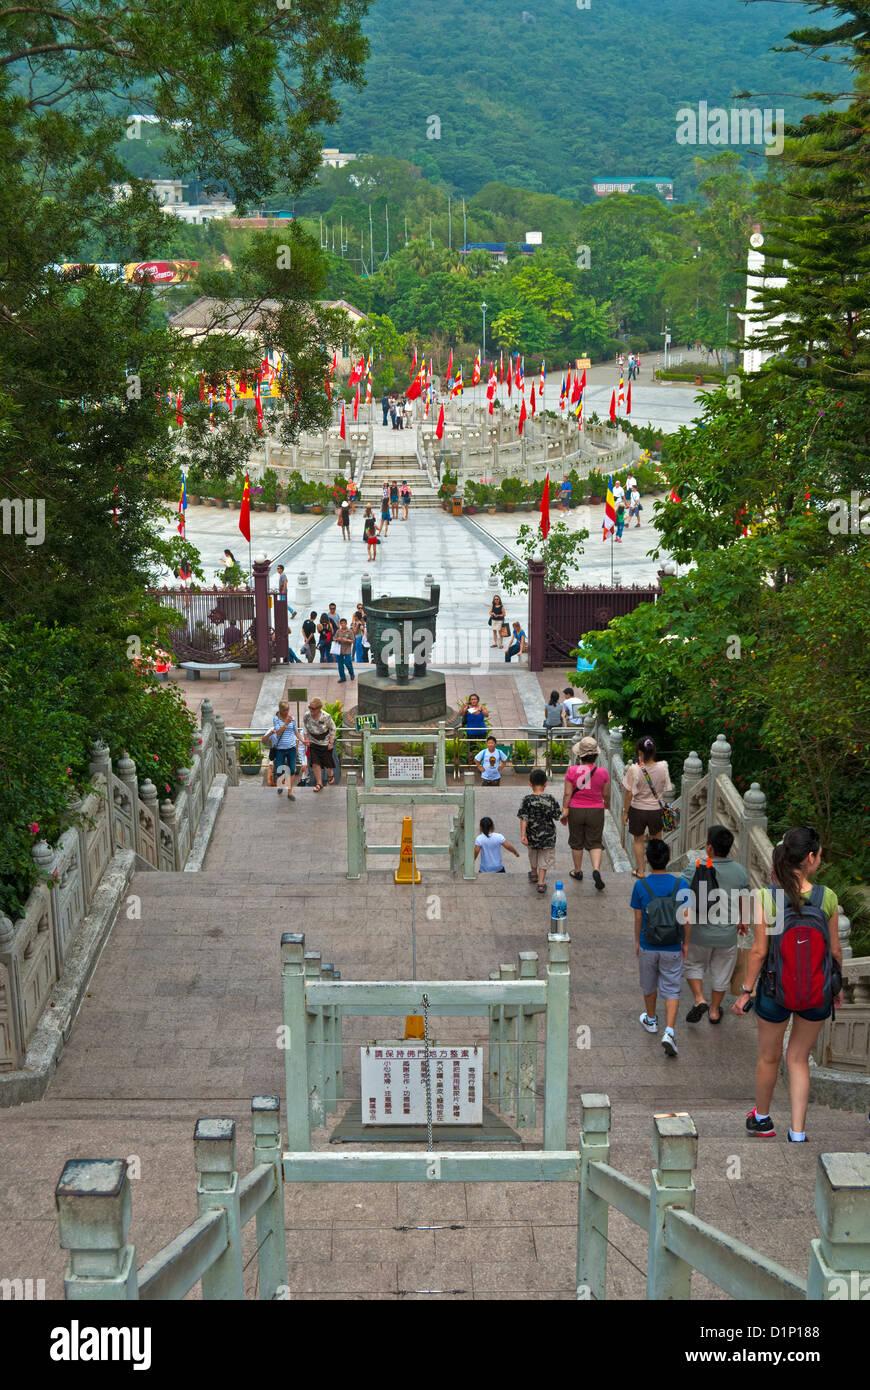 Tian Tan Buddha steps, Lantau Island, Hong Kong - Stock Image